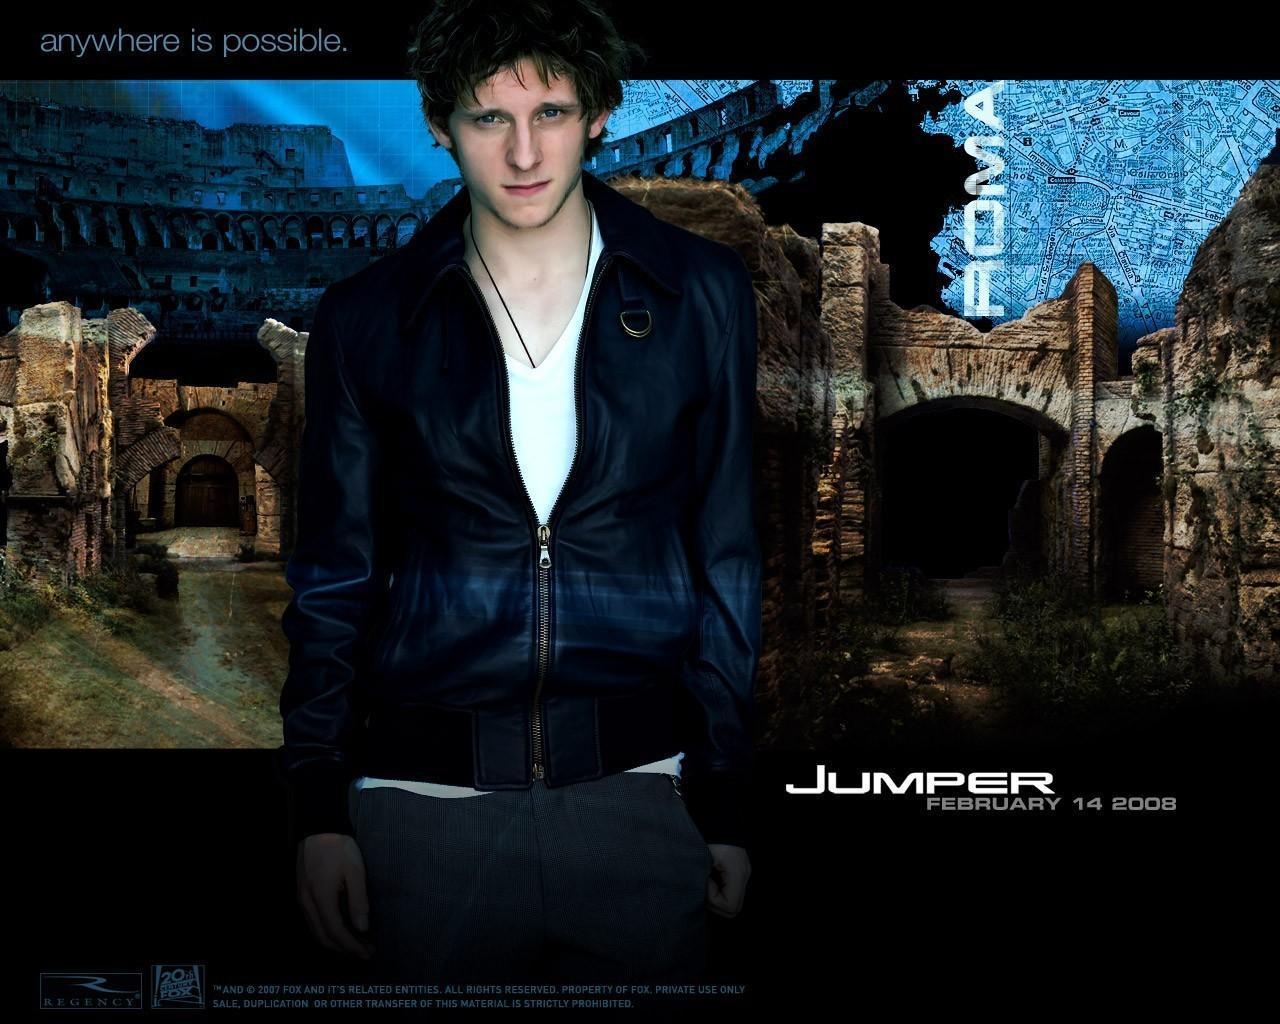 Jumper (2008) dans fiches de ses films jumper-2099544987